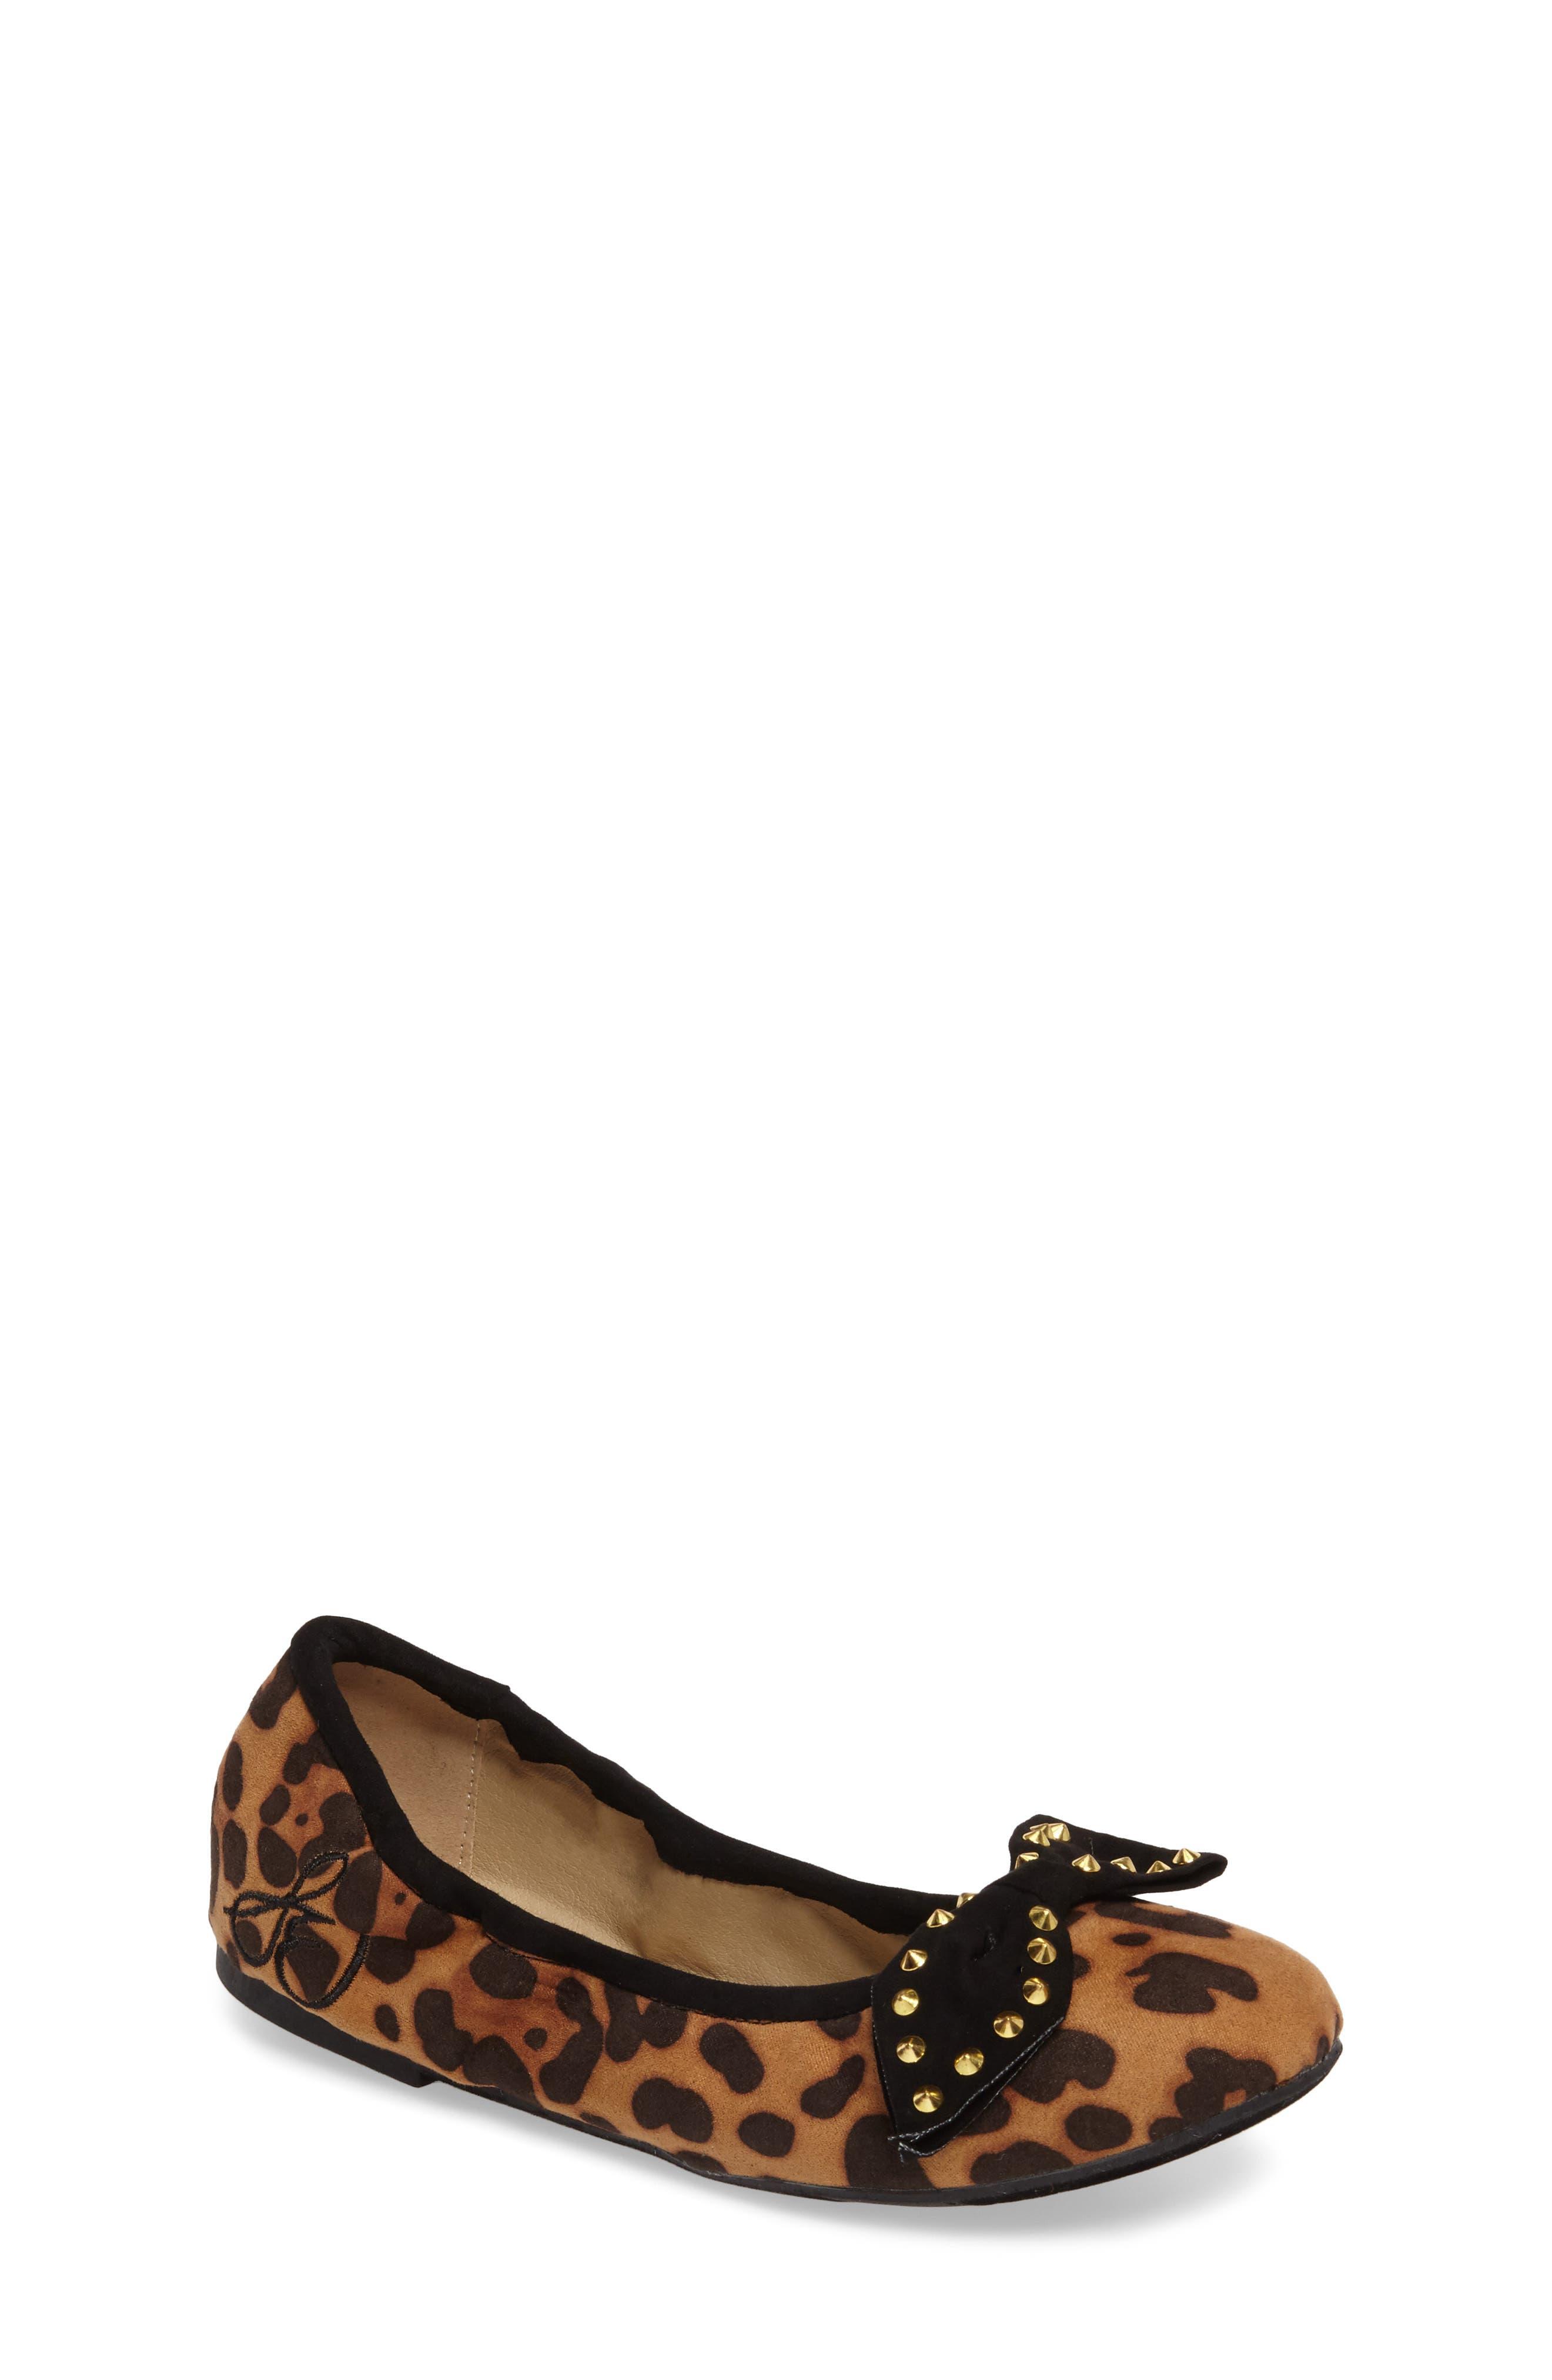 'Felicia' Ballet Flat,                             Main thumbnail 1, color,                             Black Cheetah